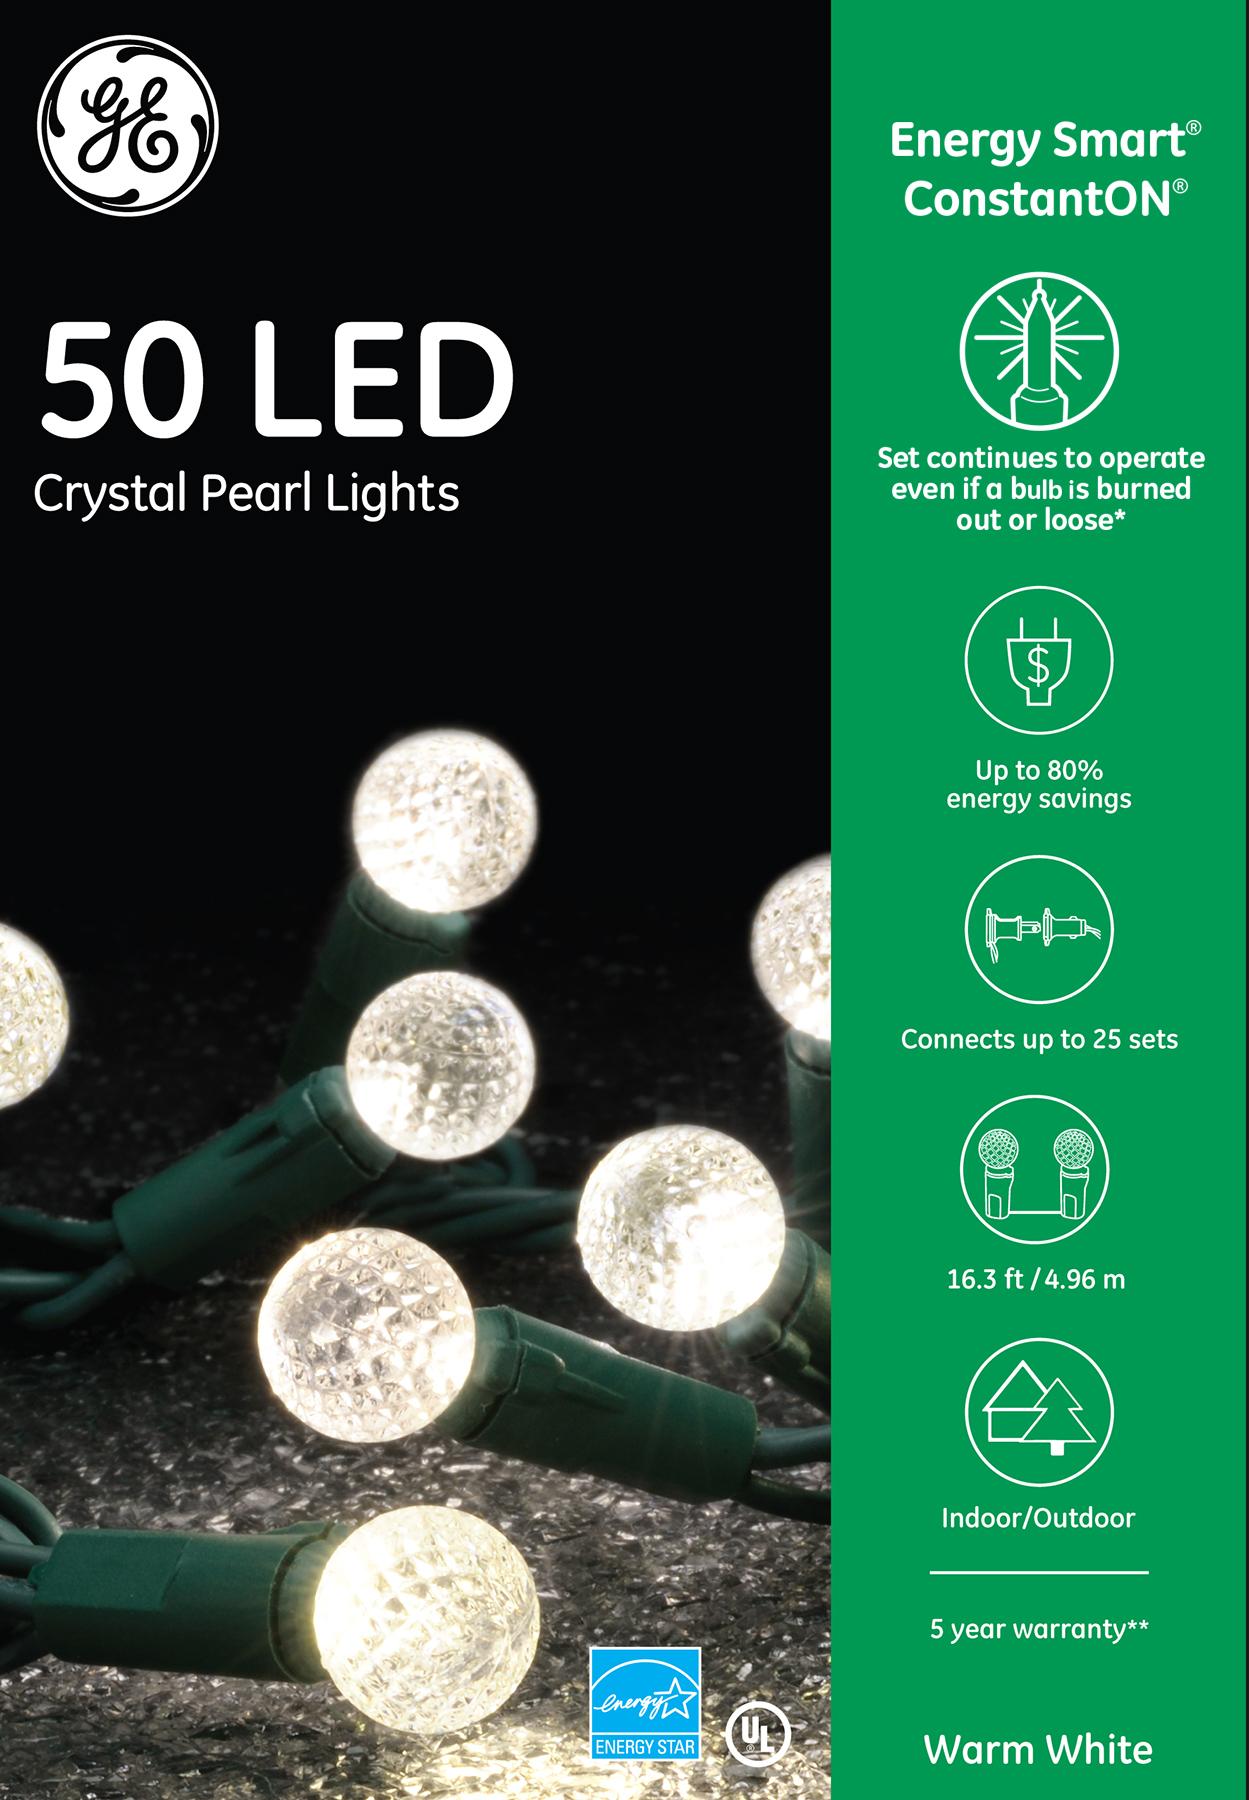 97326 Ge Energy Smart 174 Led Crystal Pearl Lights 50ct